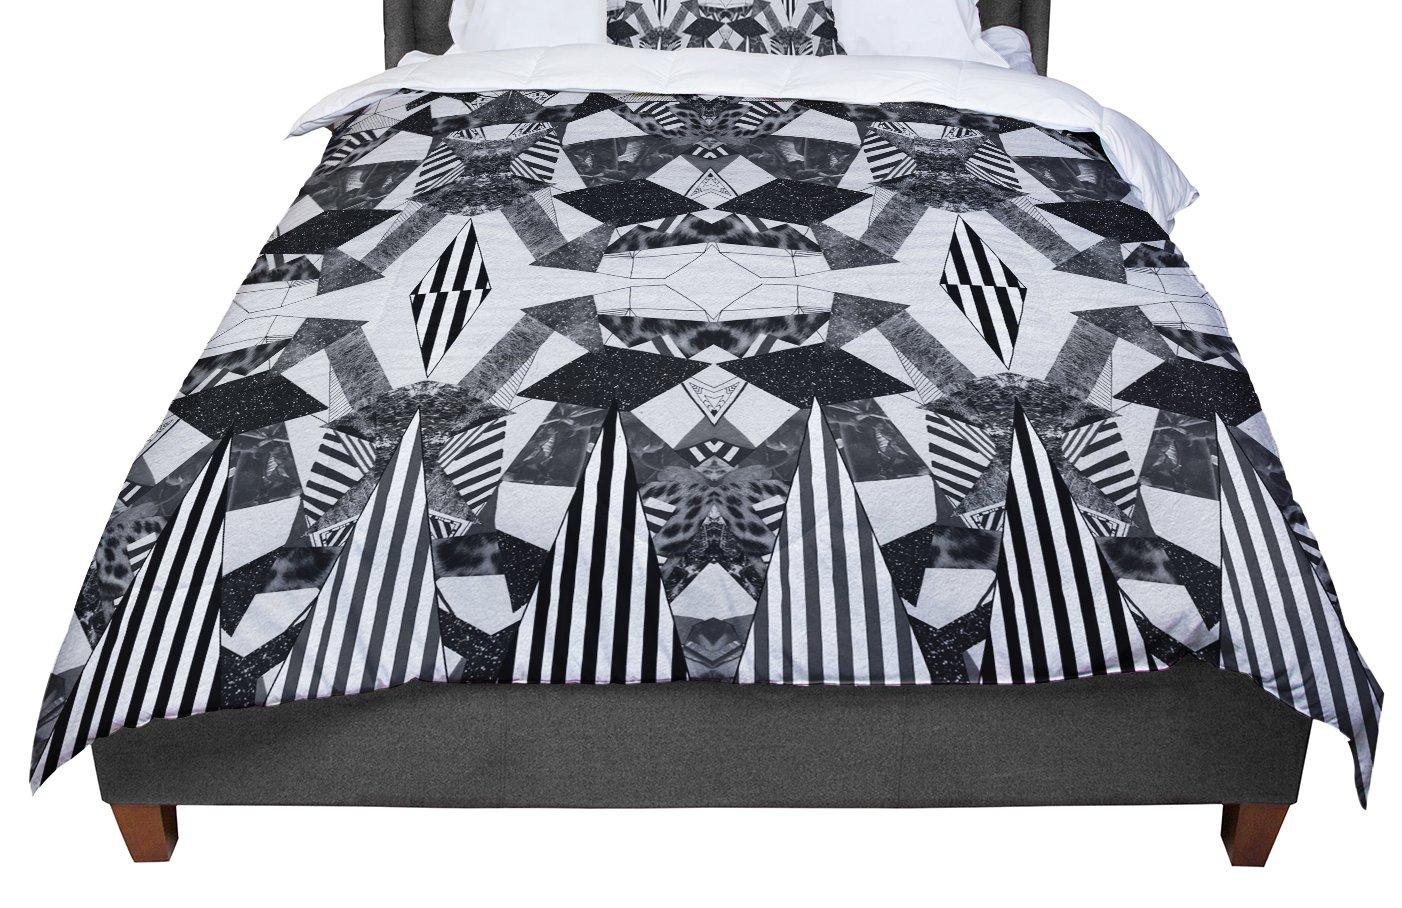 KESS InHouse Vasare Nar 'Tessellation' King/California Comforter, 104' X 88'